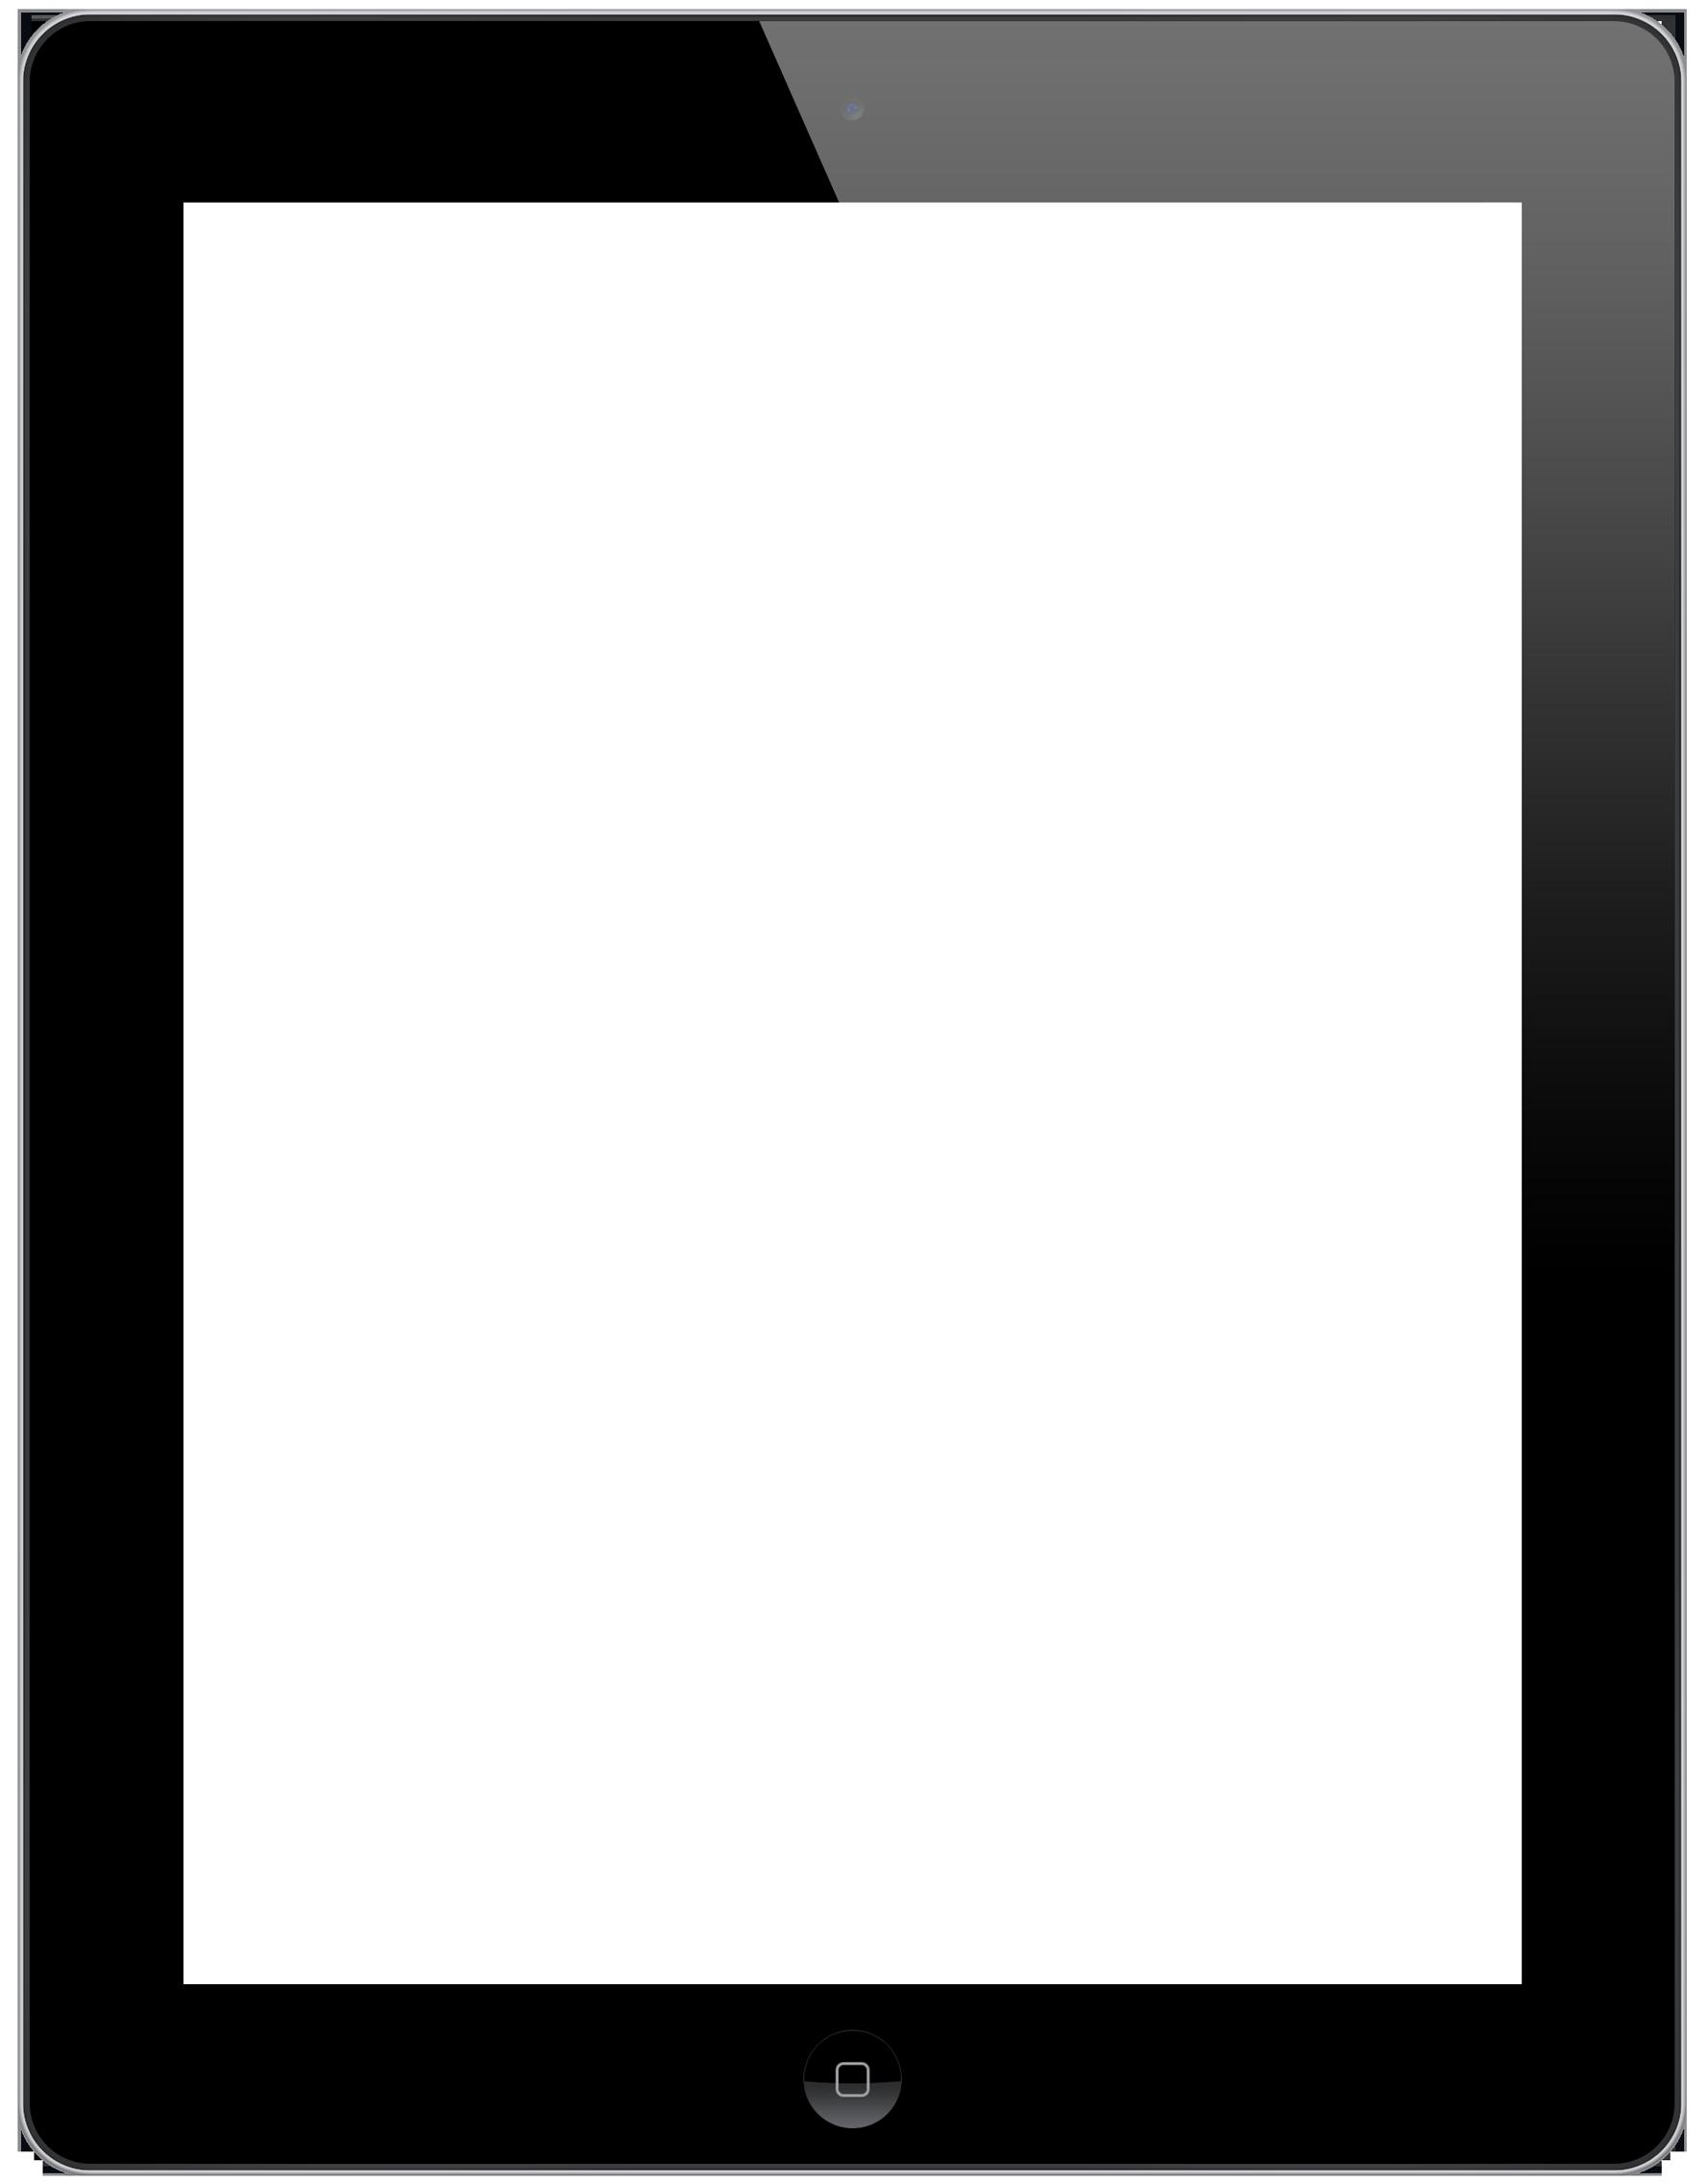 Ipad PNG Transparent Ipad.PNG Images..